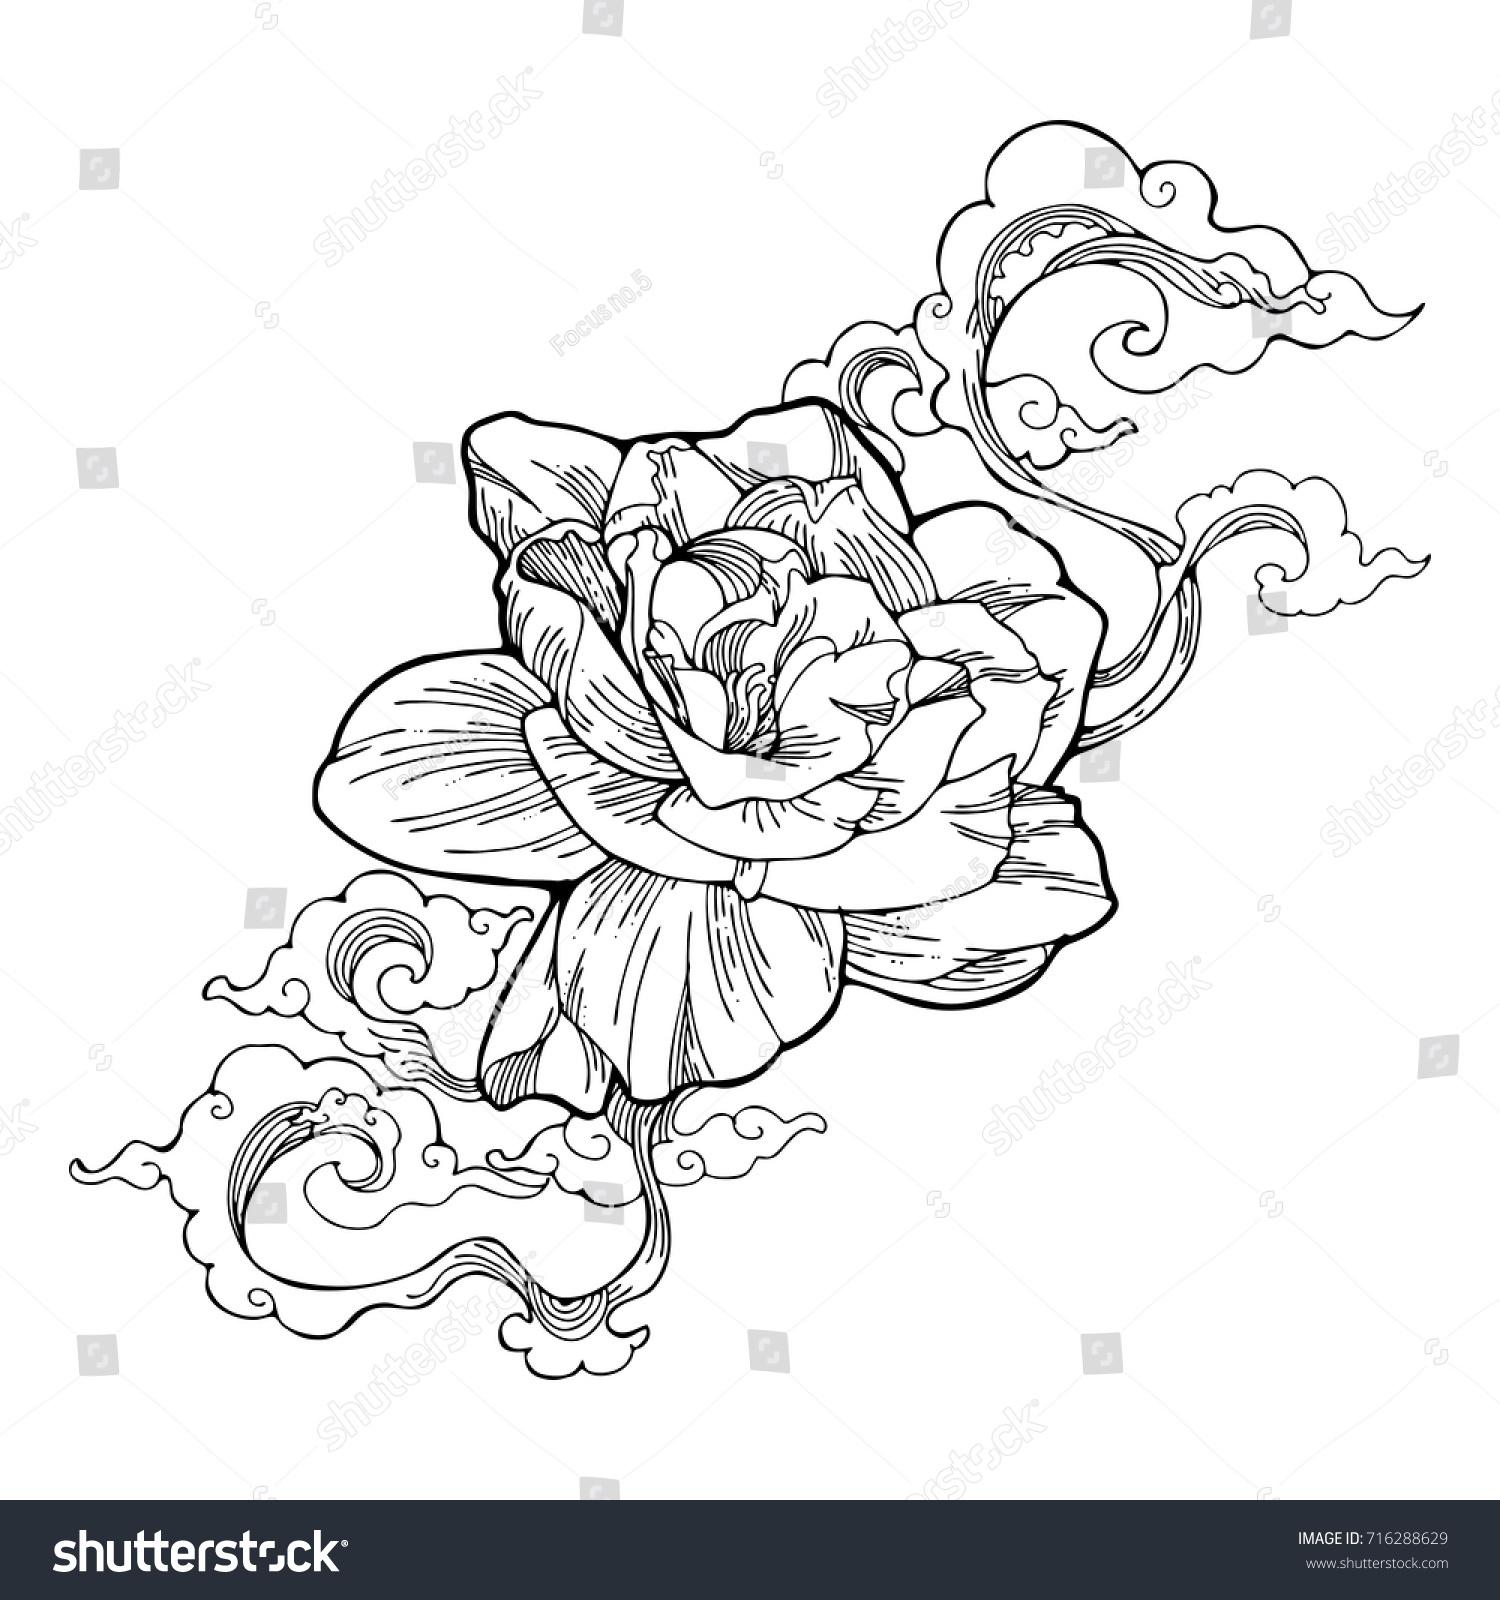 Cape jasmine gardenia jasmine aroma cloud stock vector 2018 cape jasmine gardenia jasmine and aroma cloud design by ink drawing tattoo vector with white izmirmasajfo Images